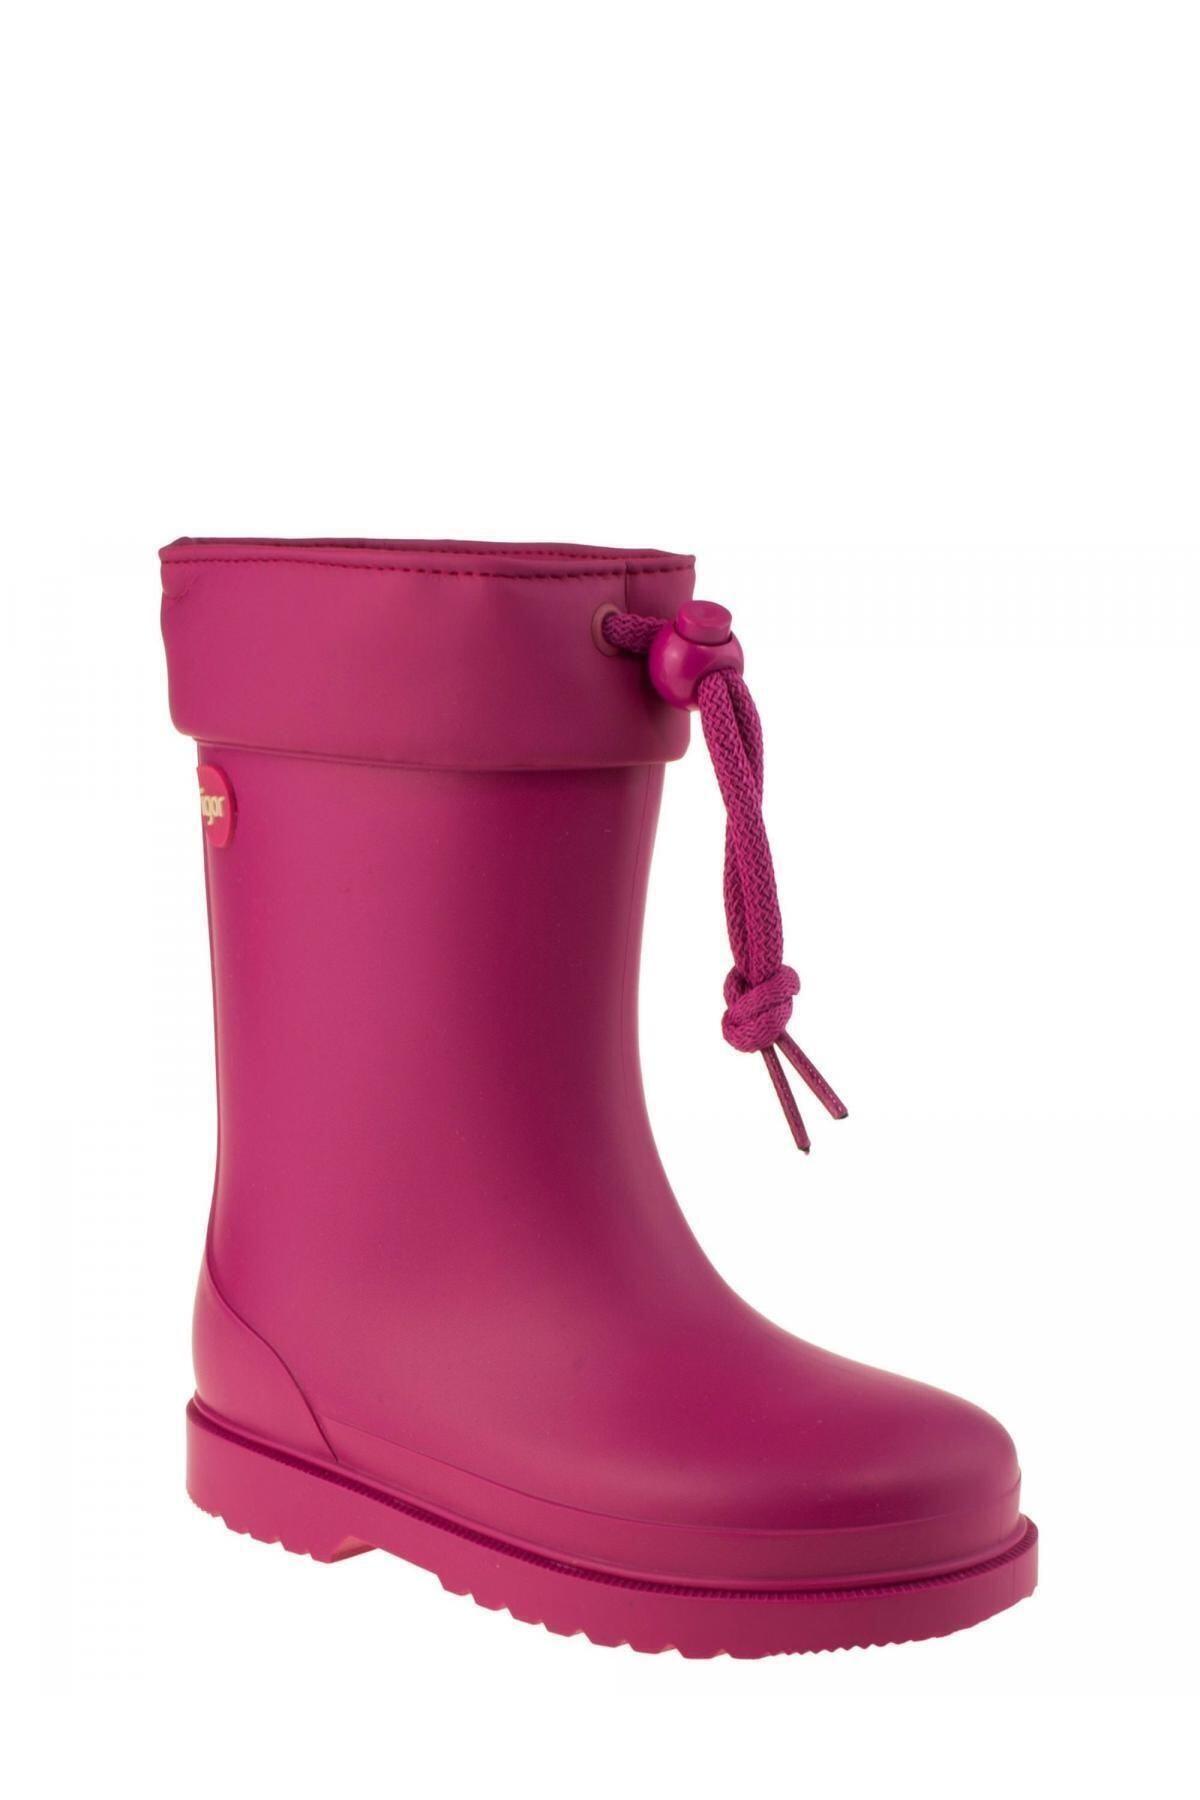 IGOR CHUFO CUELLO Fuşya Kız Çocuk Yağmur Çizmesi 100386306 1